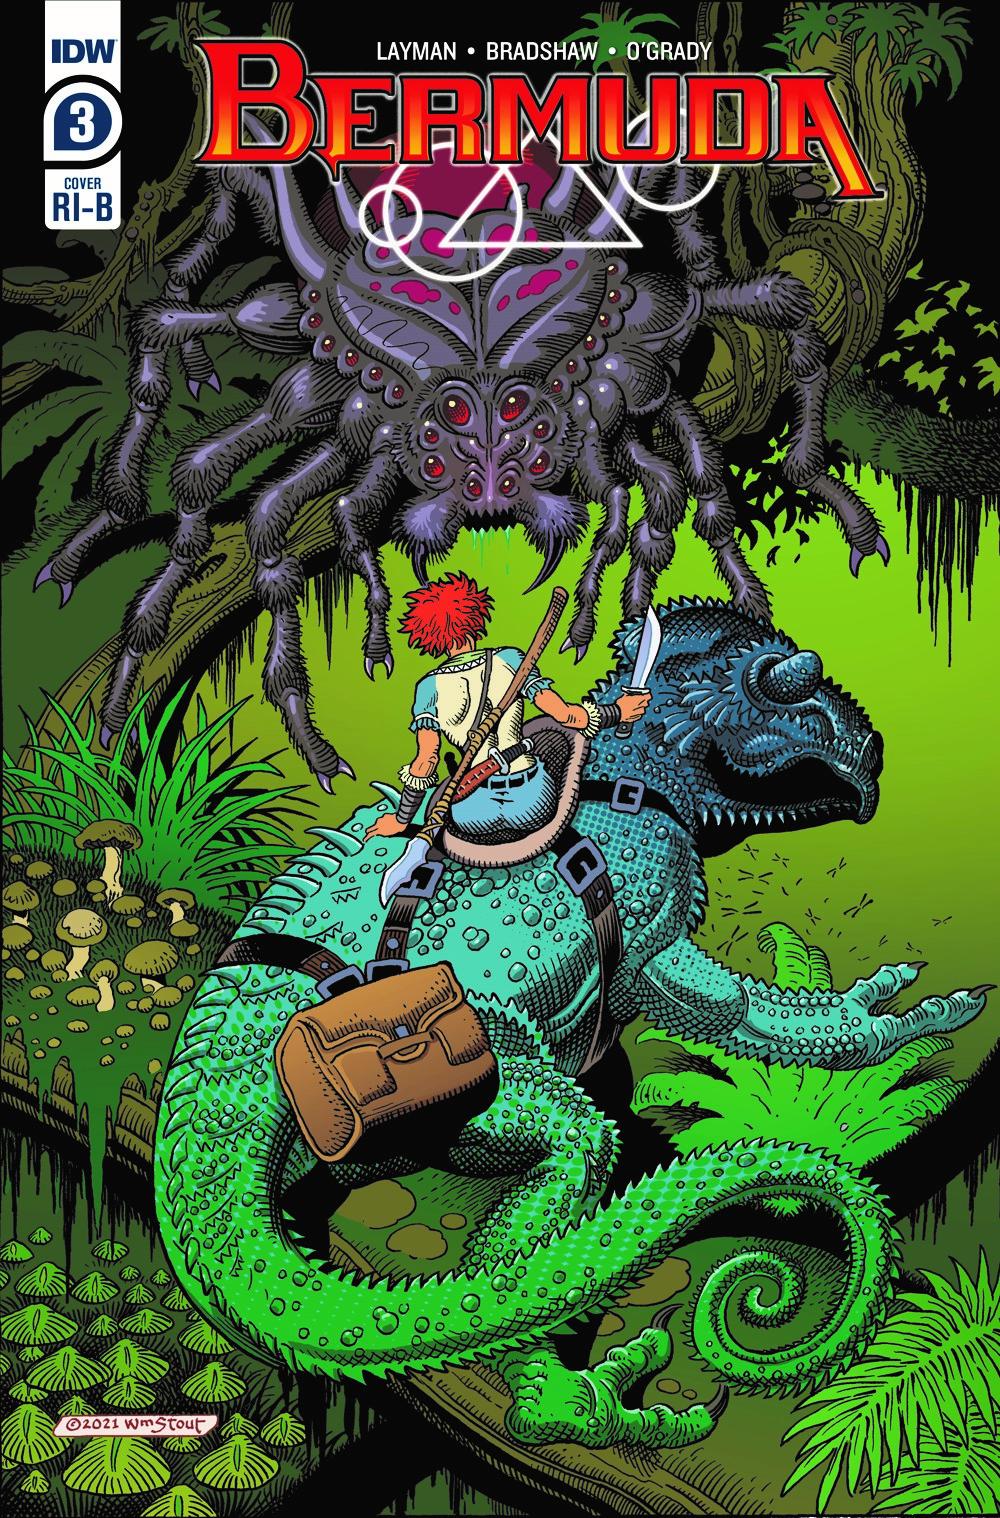 Bermuda03_CVR_RI_B ComicList: IDW Publishing New Releases for 09/15/2021